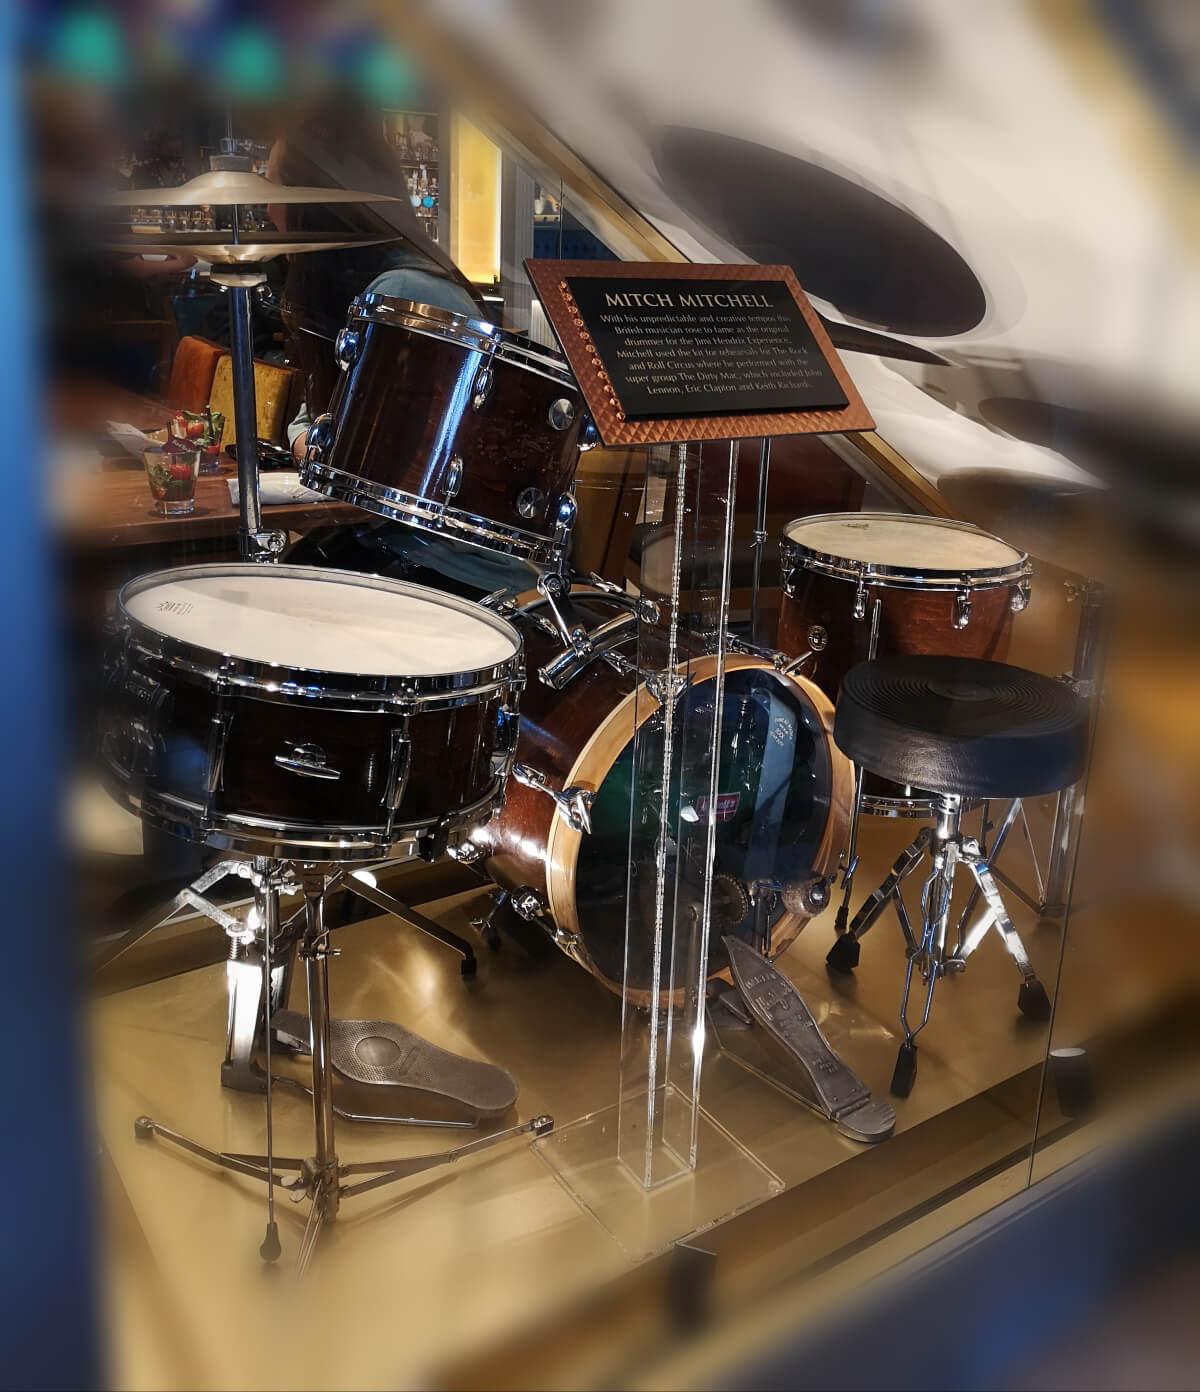 Drun set belonging to Mitch Mitchell from Jimi Hendrix experience